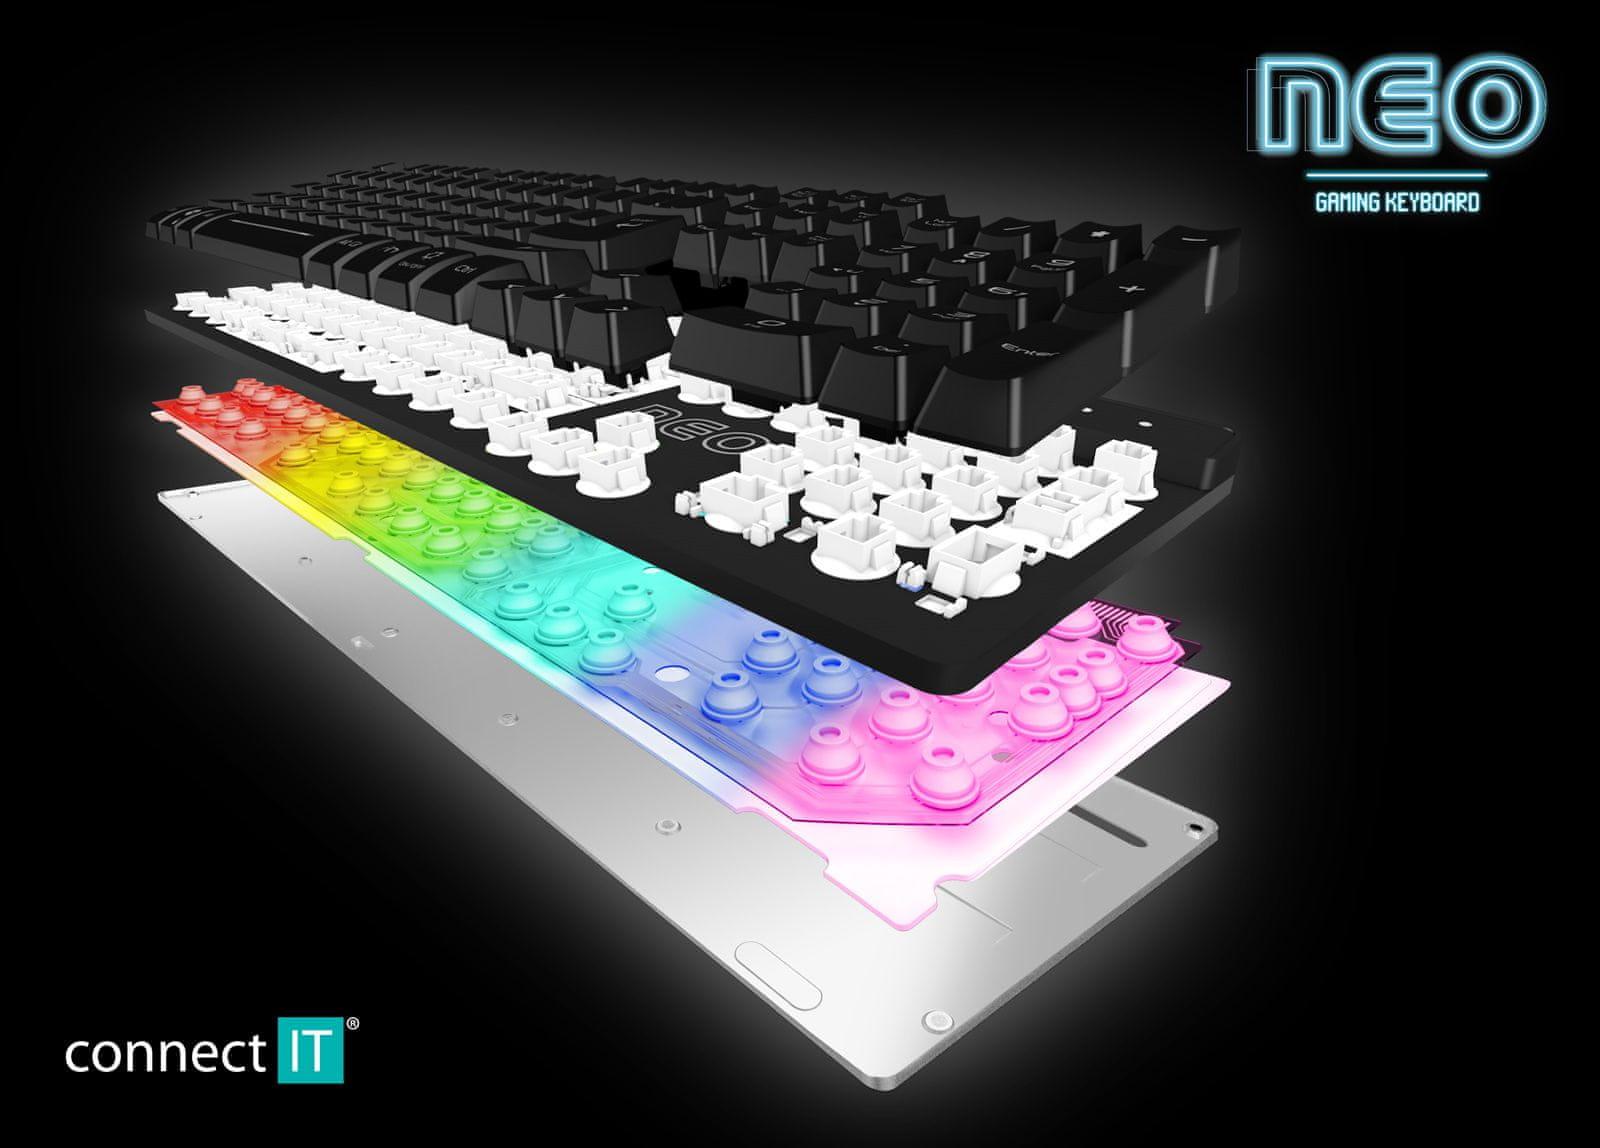 12 multimediálnych kláves WASD Plug Play Anti-ghost Win-Lock Connect IT Nero CZ SK